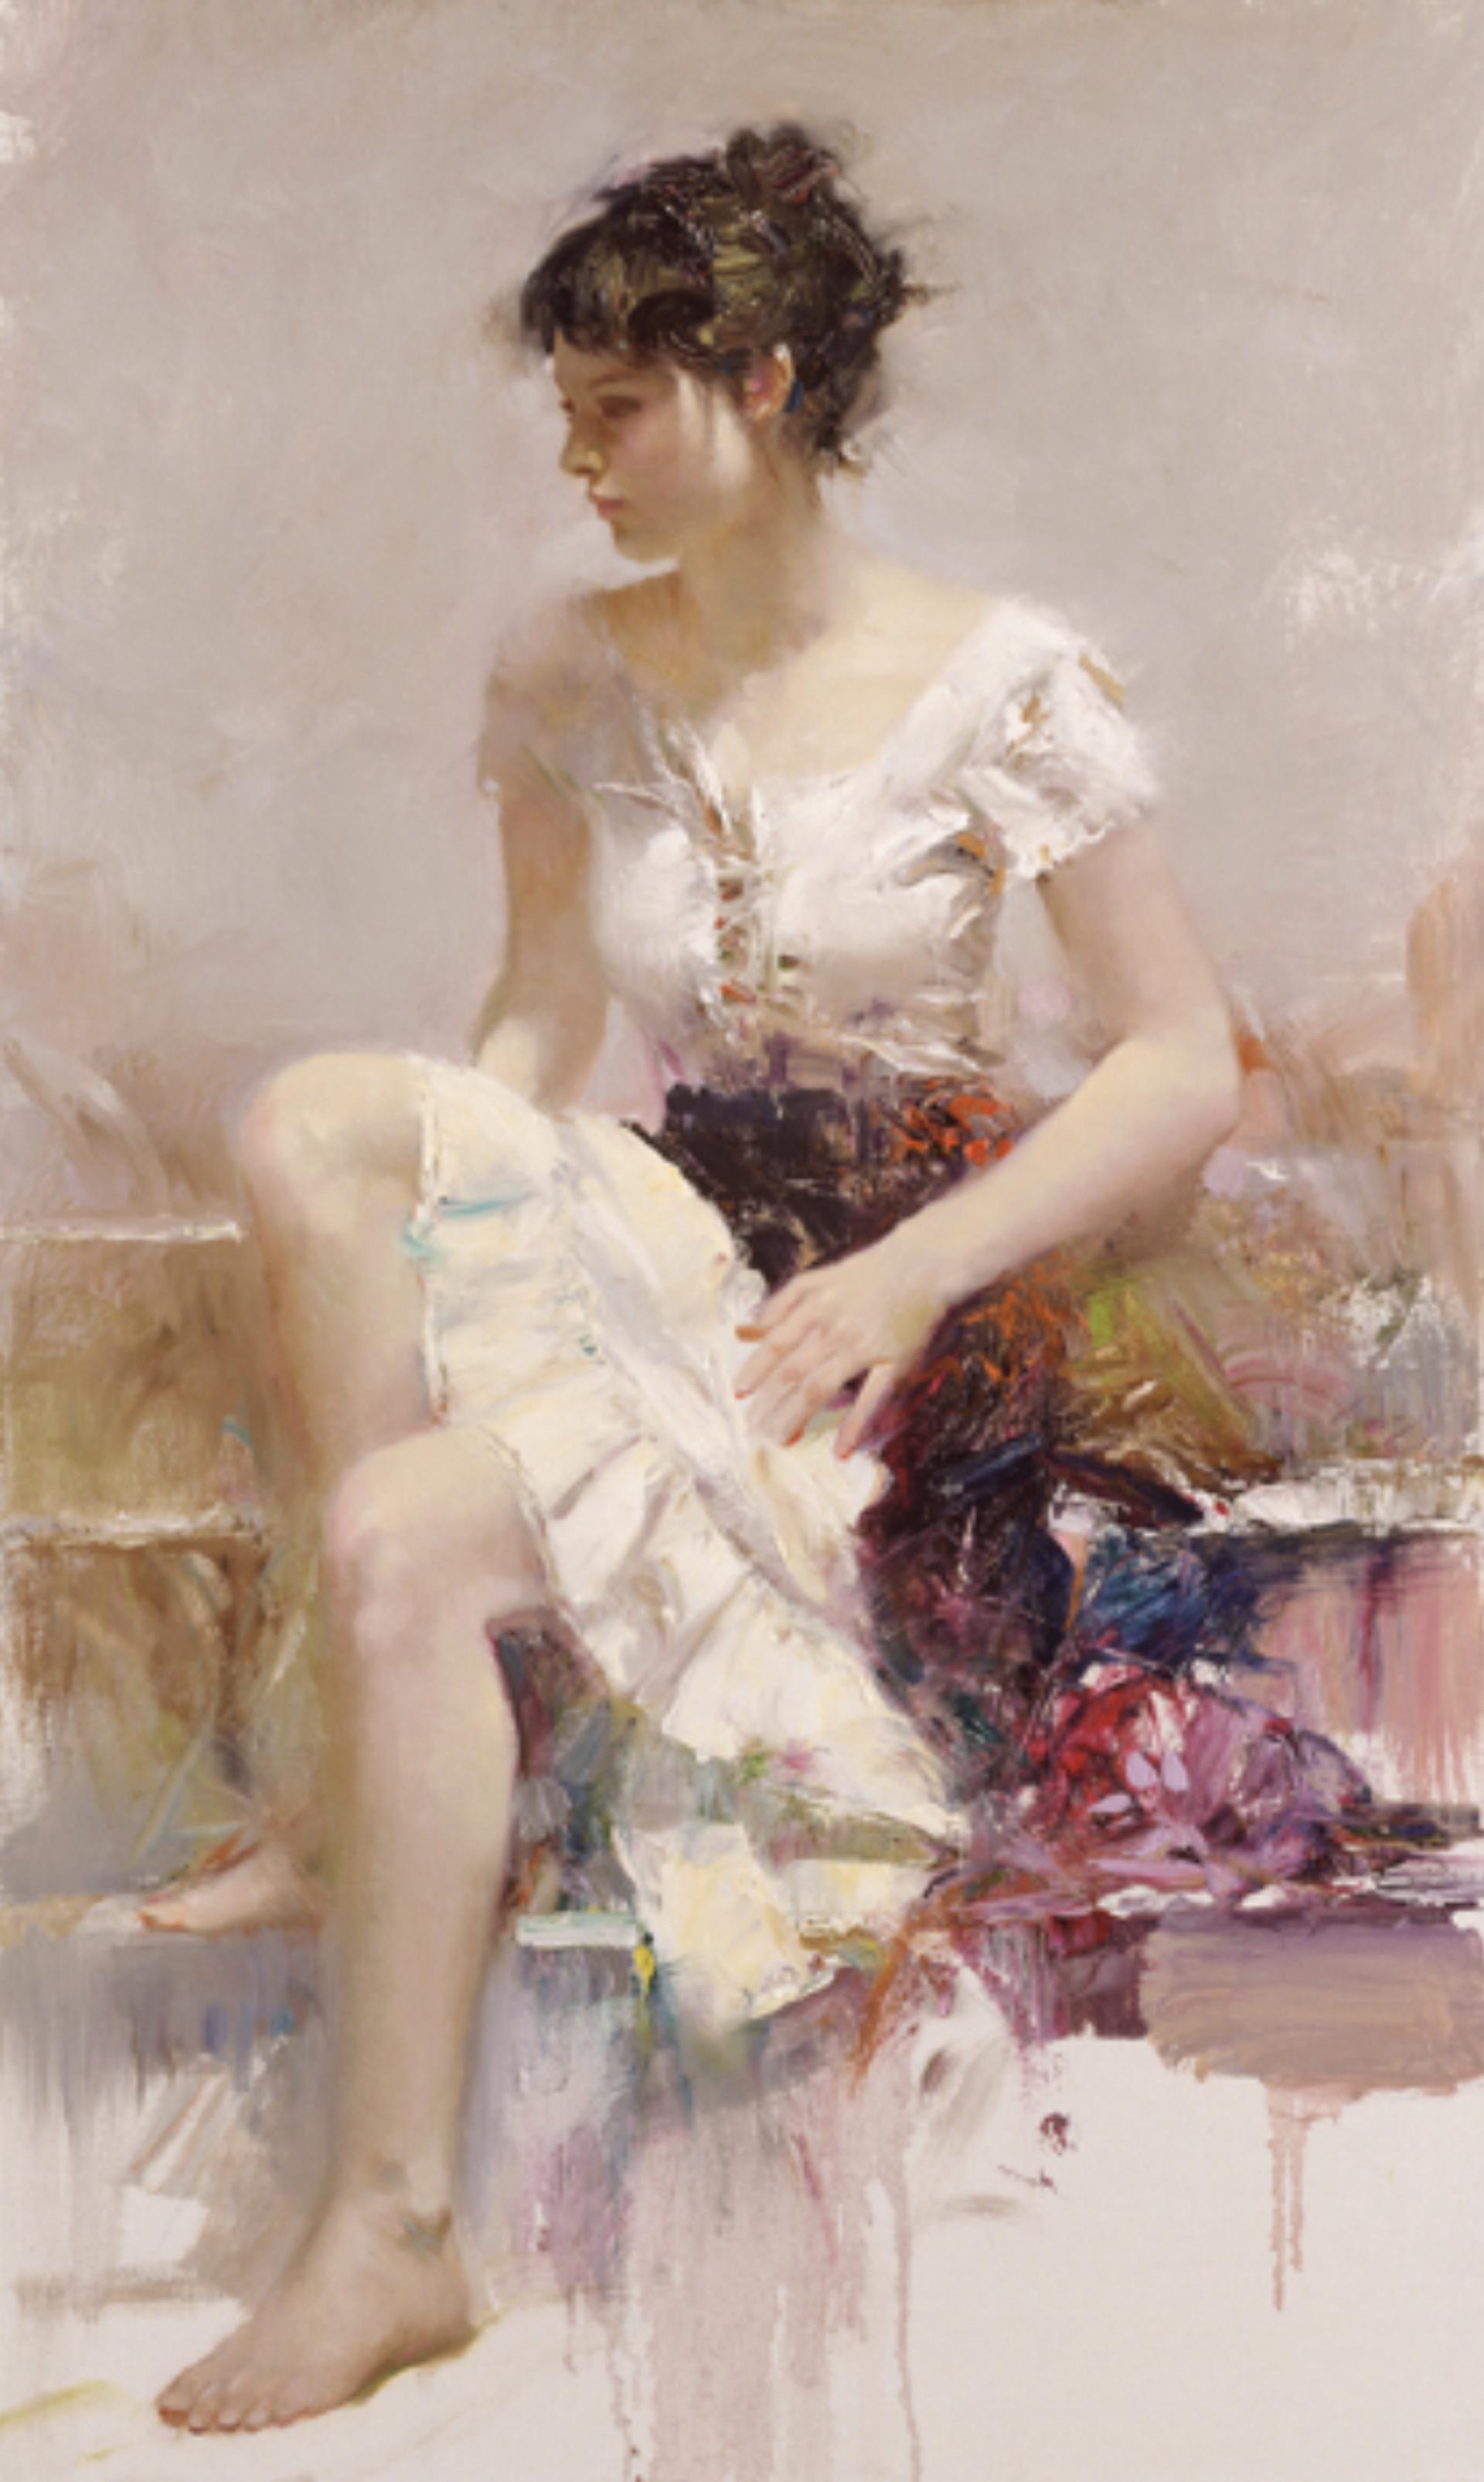 White Lace by Pino